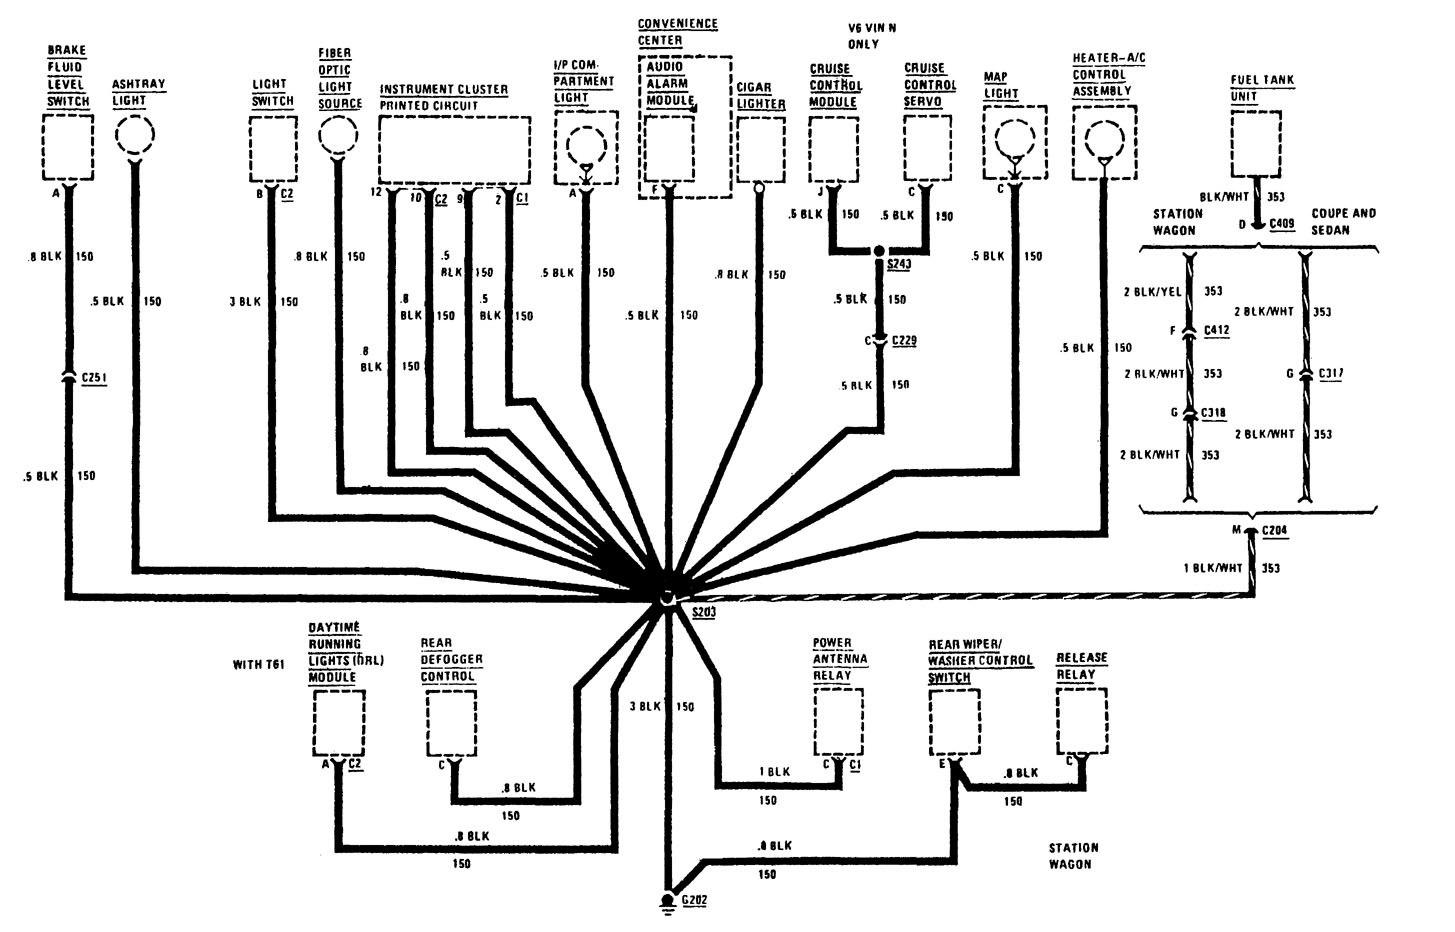 buick century  1991  - wiring diagrams